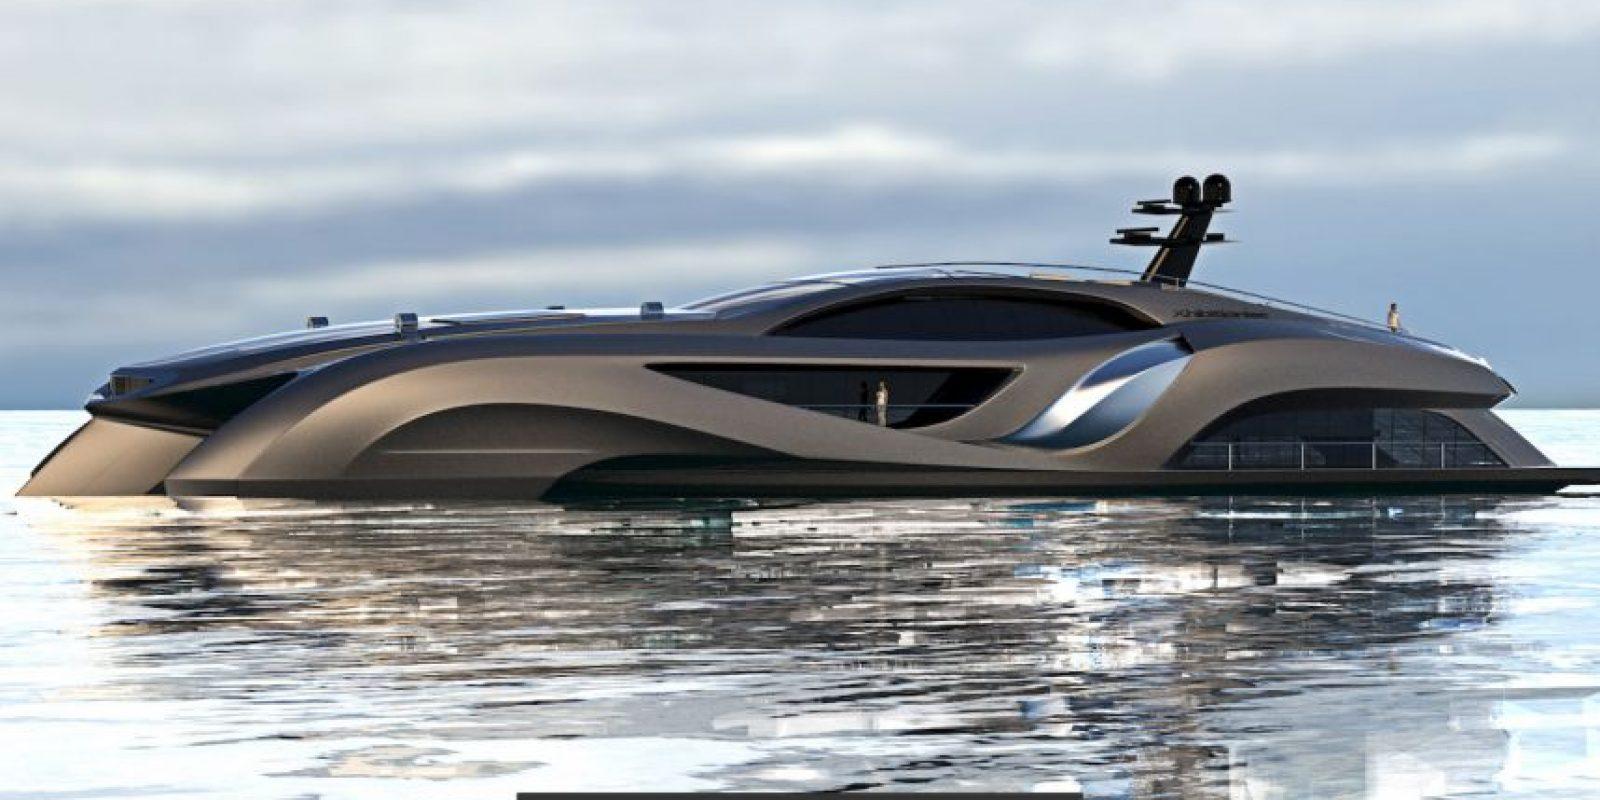 Foto: Graydesign.se